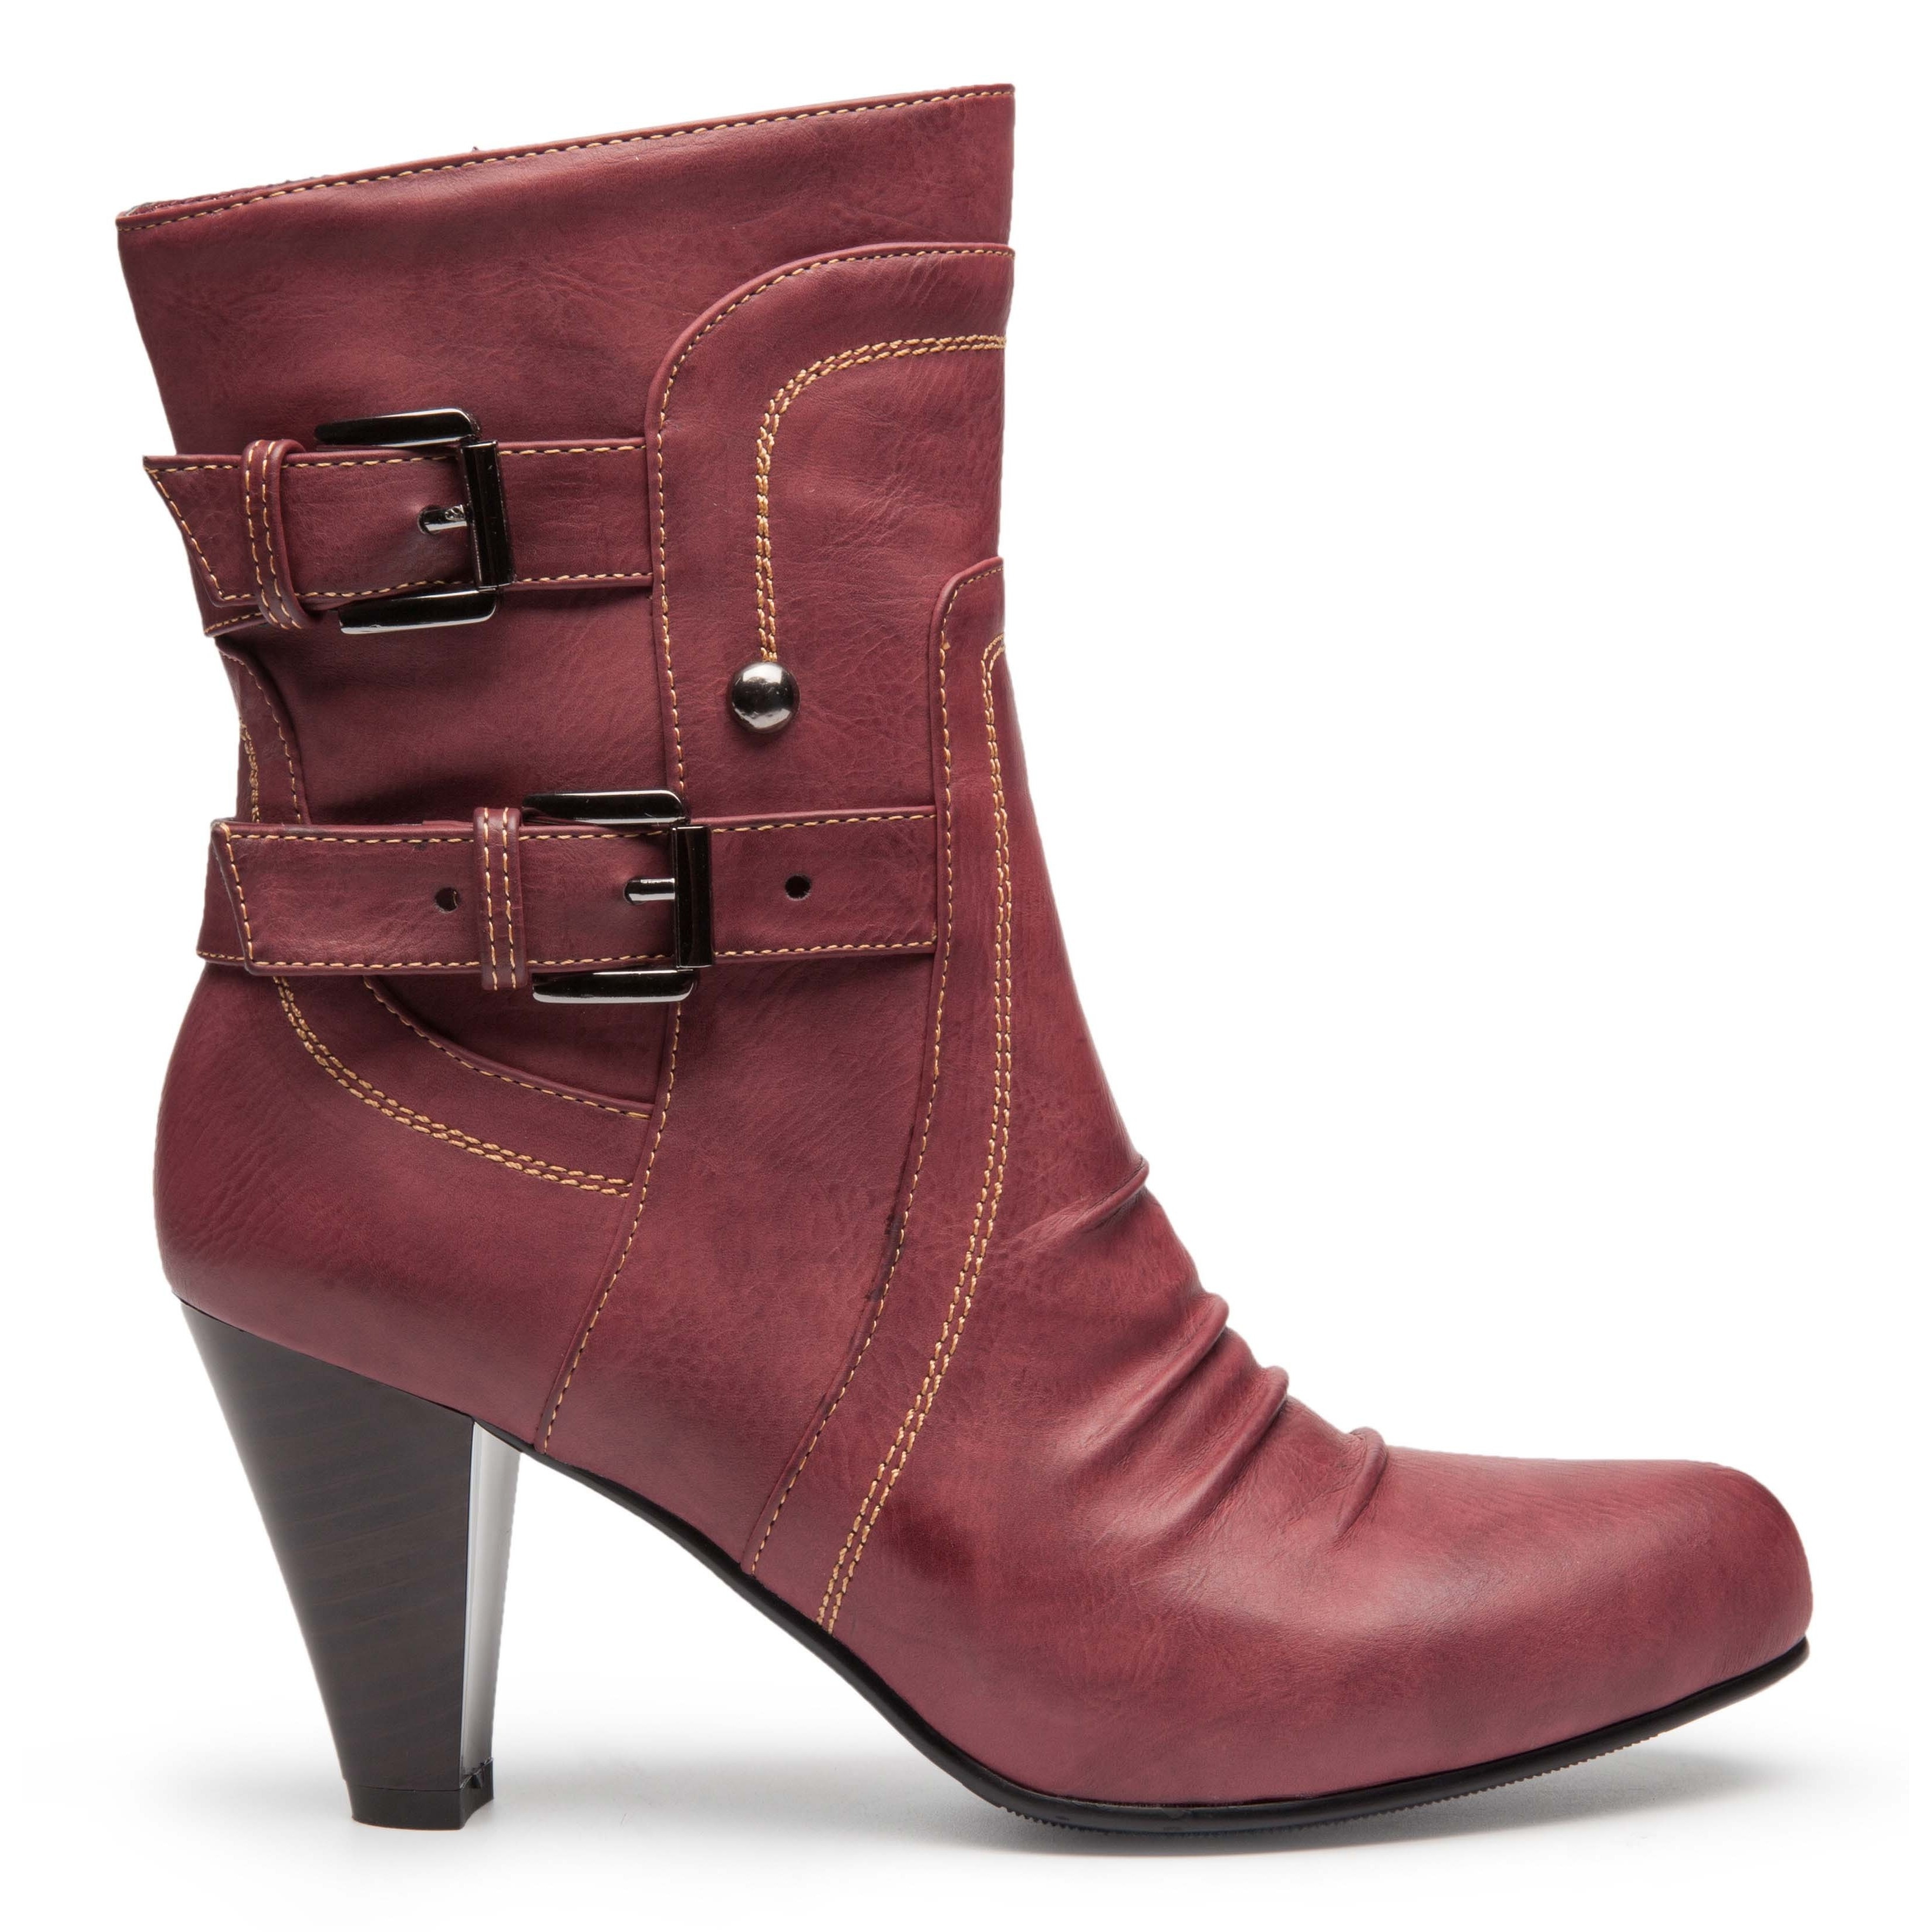 Ann Creek Women's 'Calora' Ankle Boots